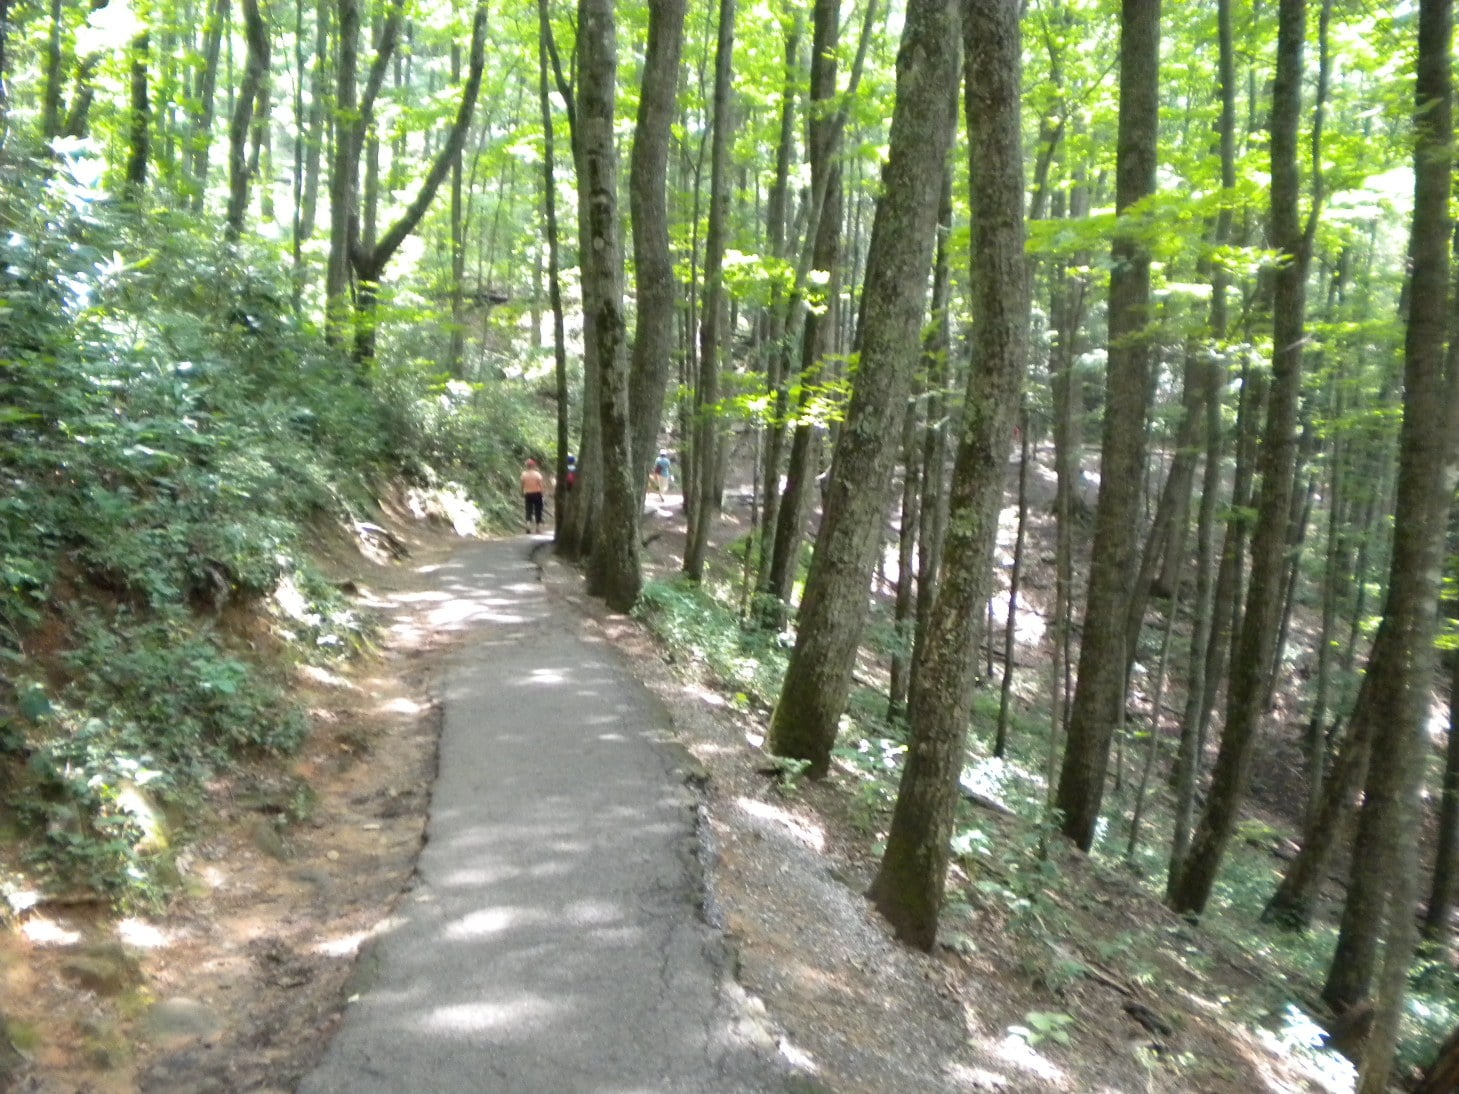 6-3-2014 Laurel Falls Hike – Tree Lined Trail